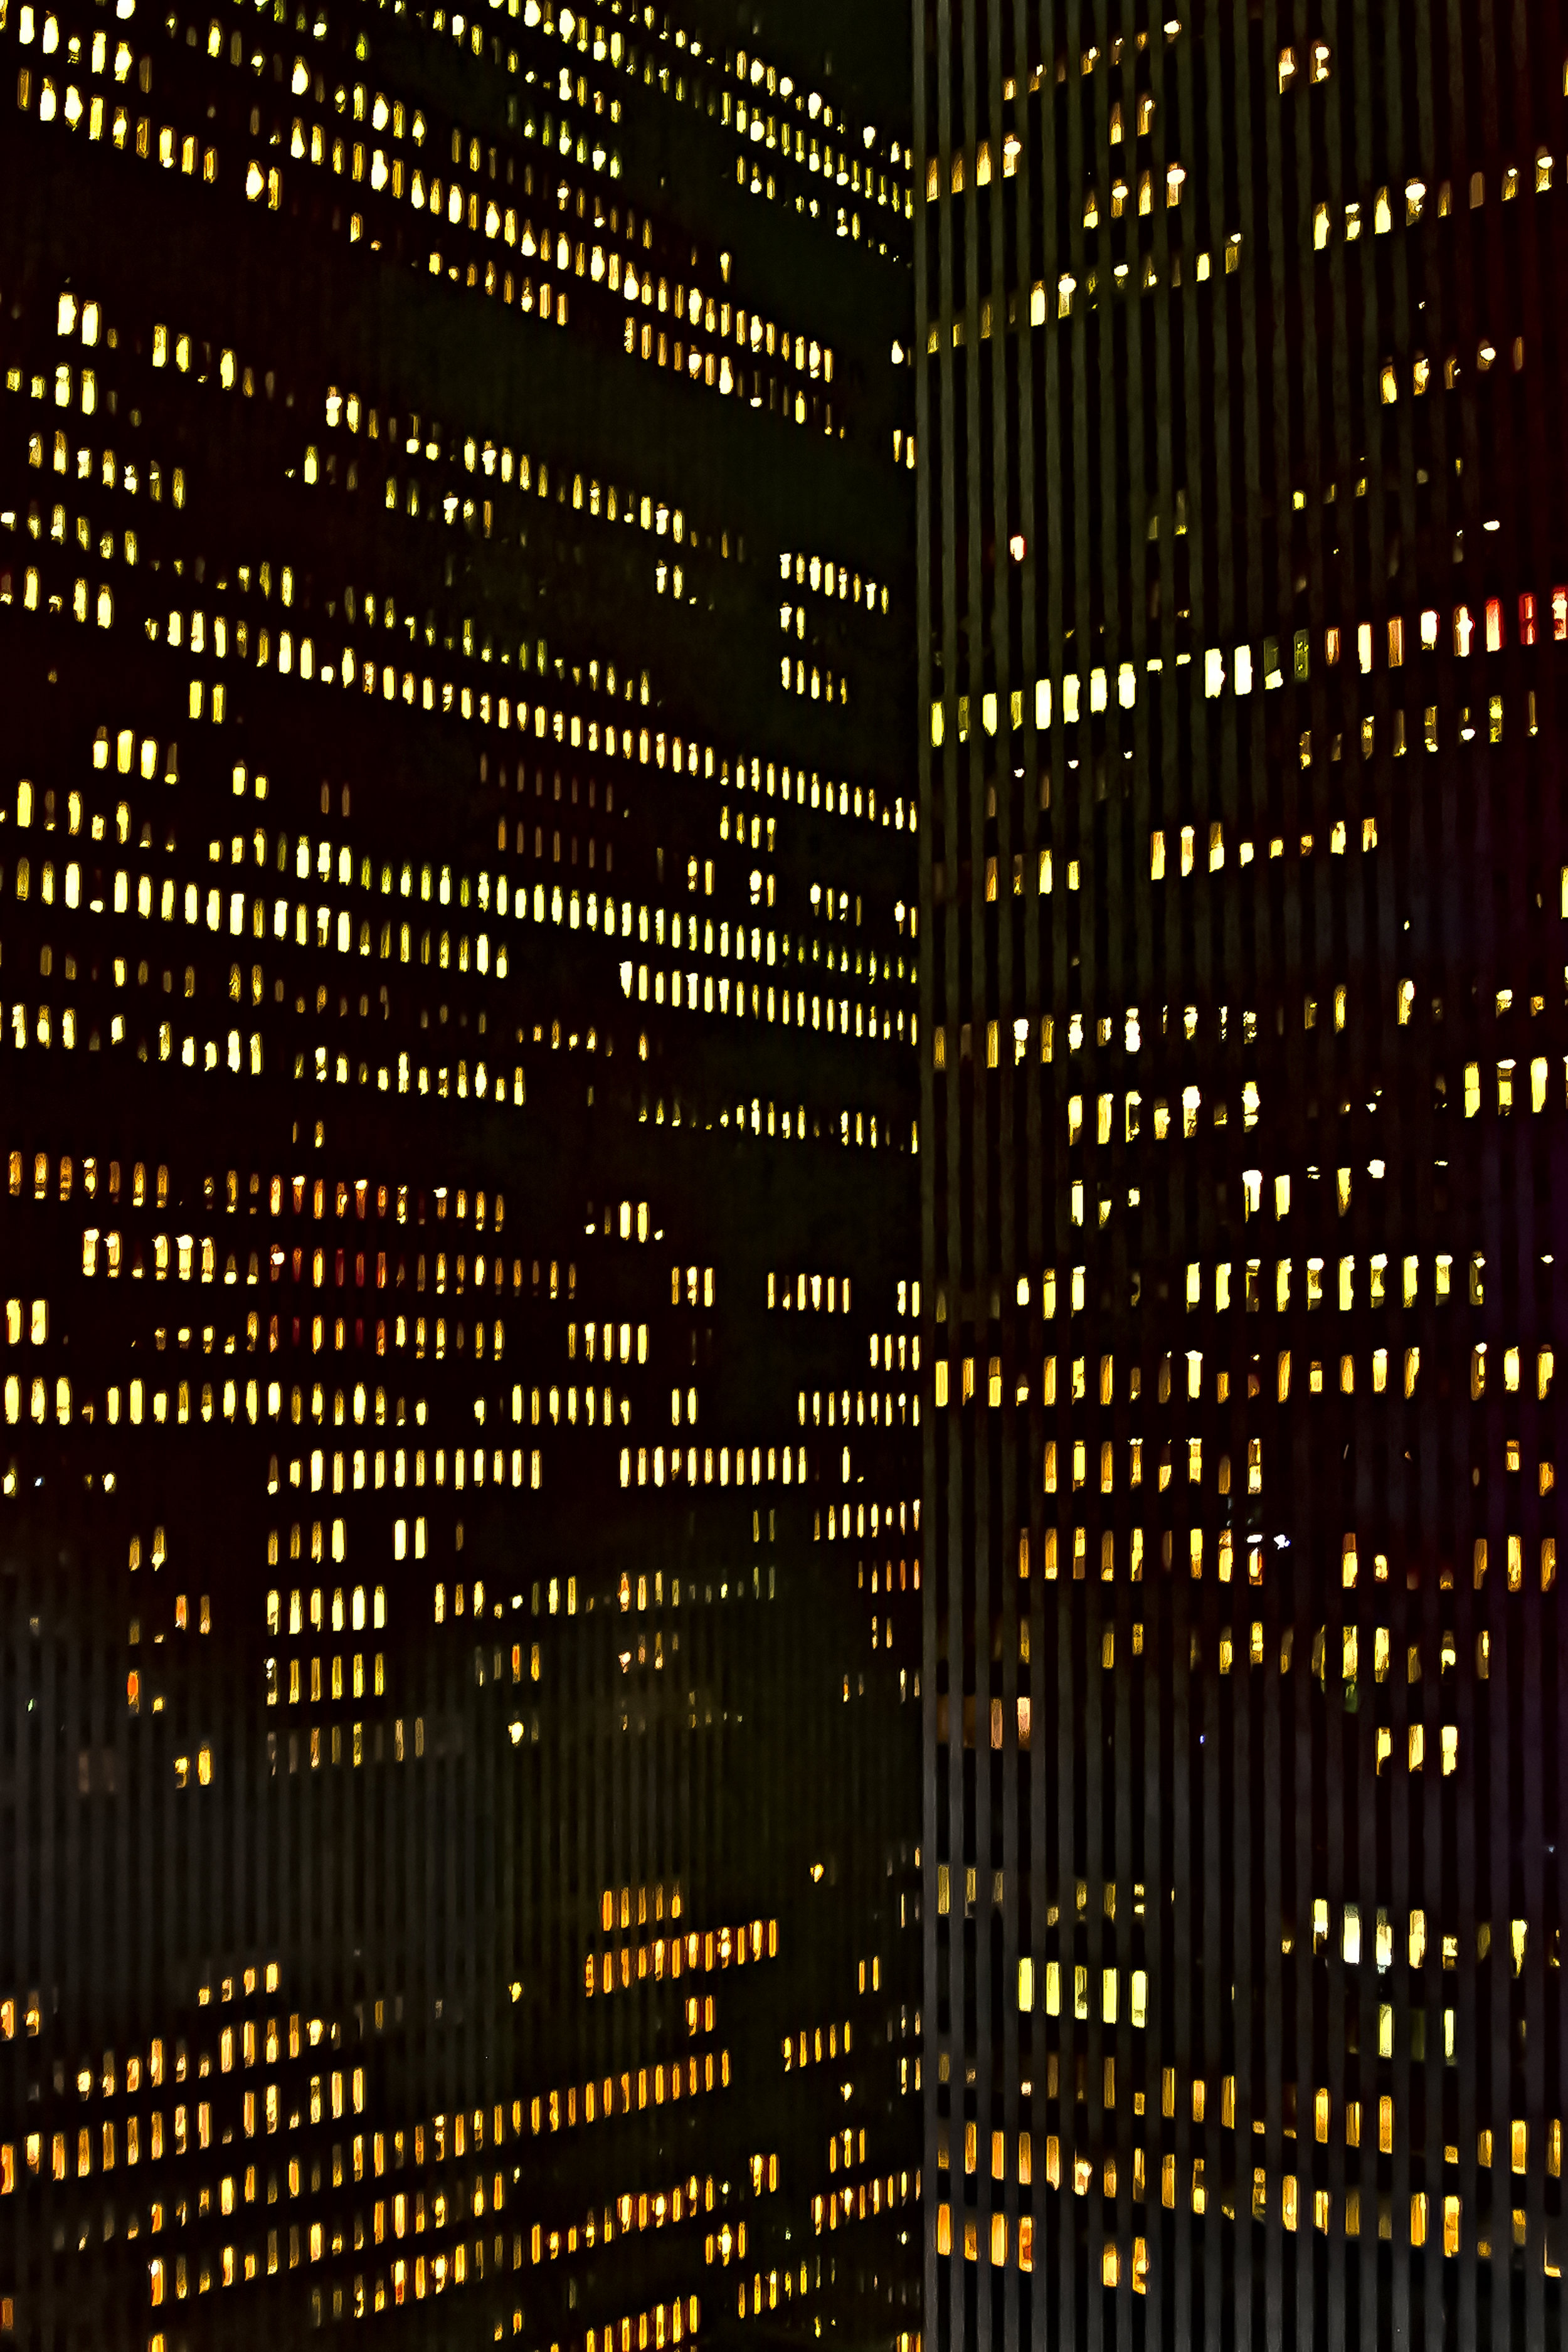 NYCSkyscraperSharo18x12.jpg